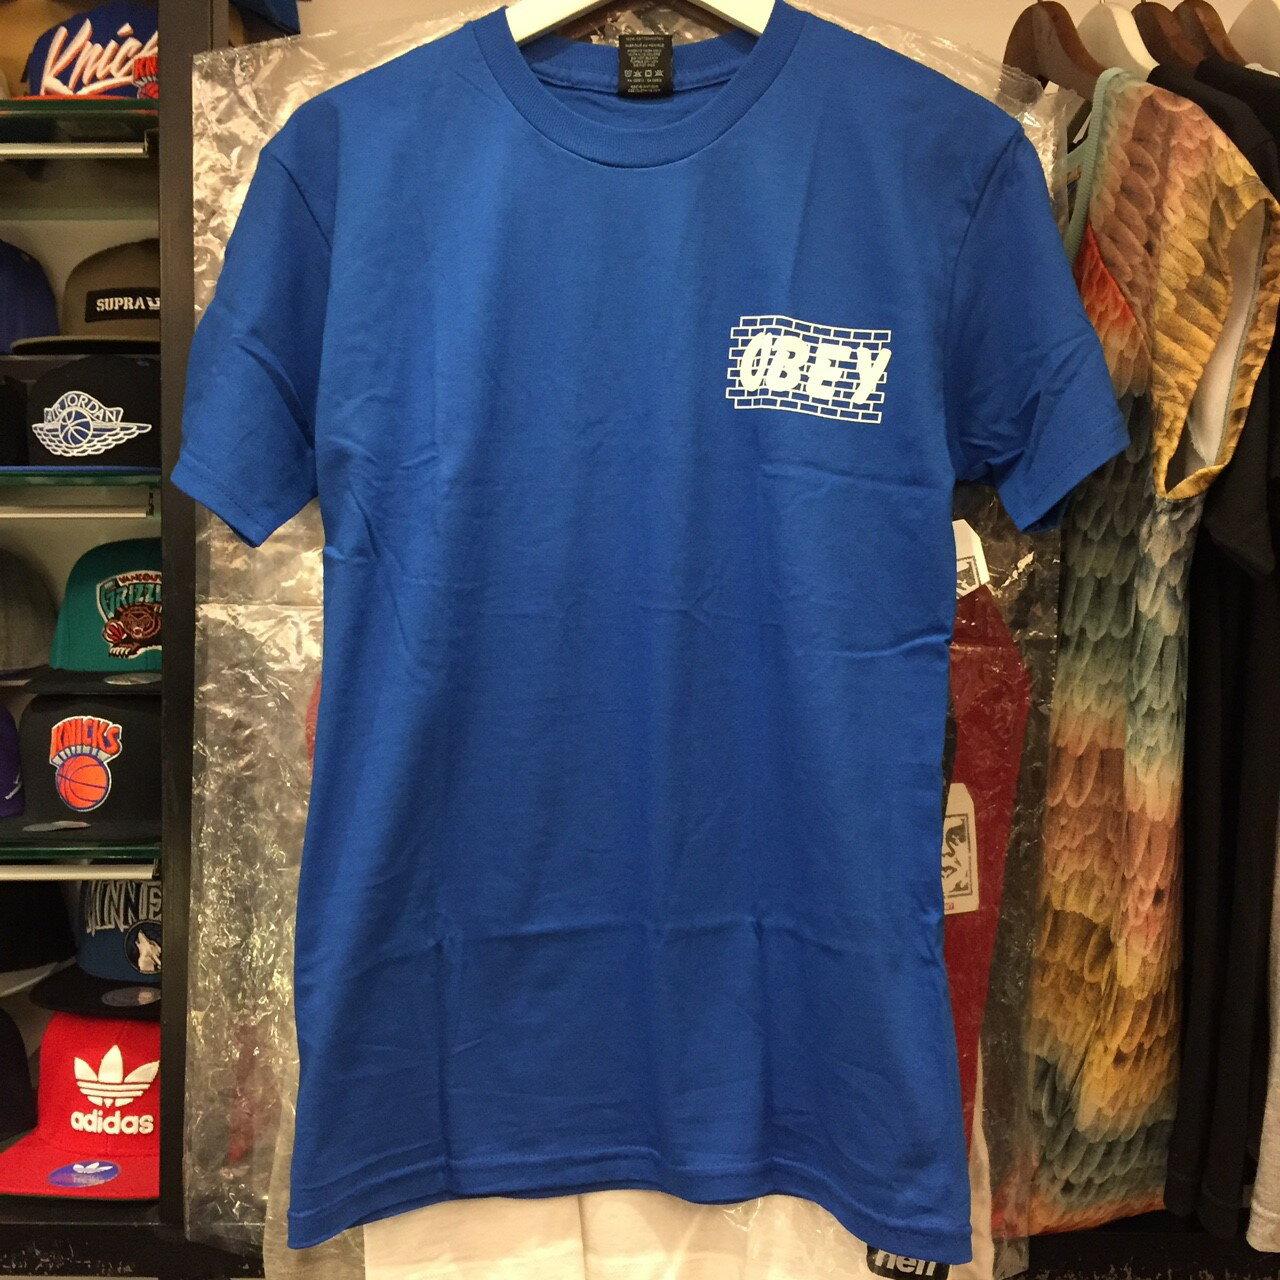 BEETLE PLUS 西門町經銷 全新 美國品牌 OBEY BRICK WALL TEE 磚牆 寶藍 白字 藍白 LOGO 短T TEE 163081179ROY OB-419 0